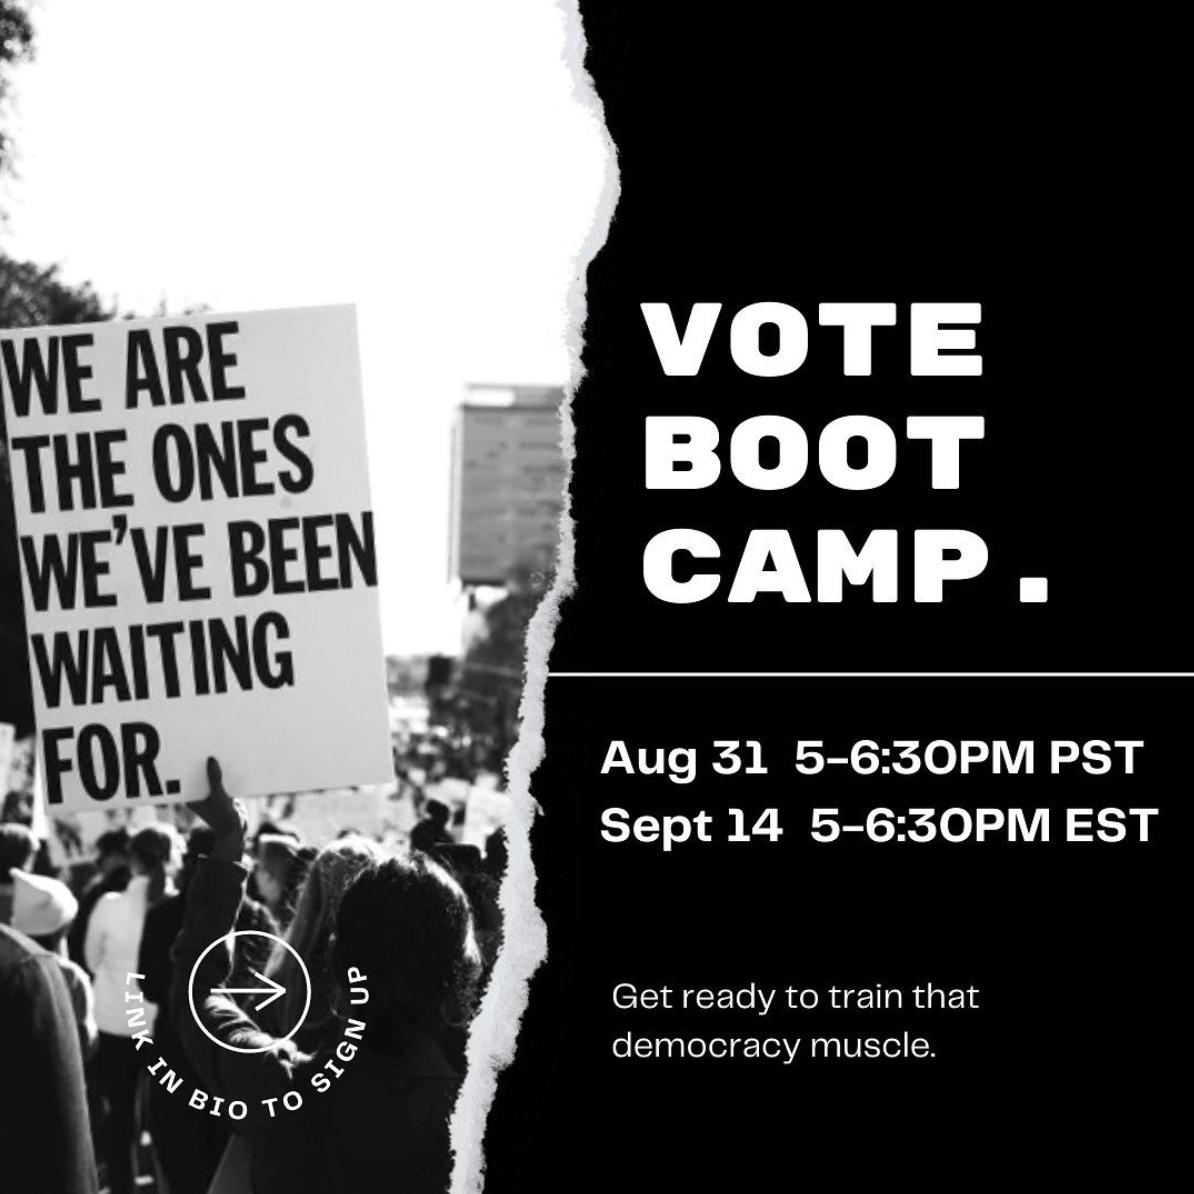 Vote Bootcamp